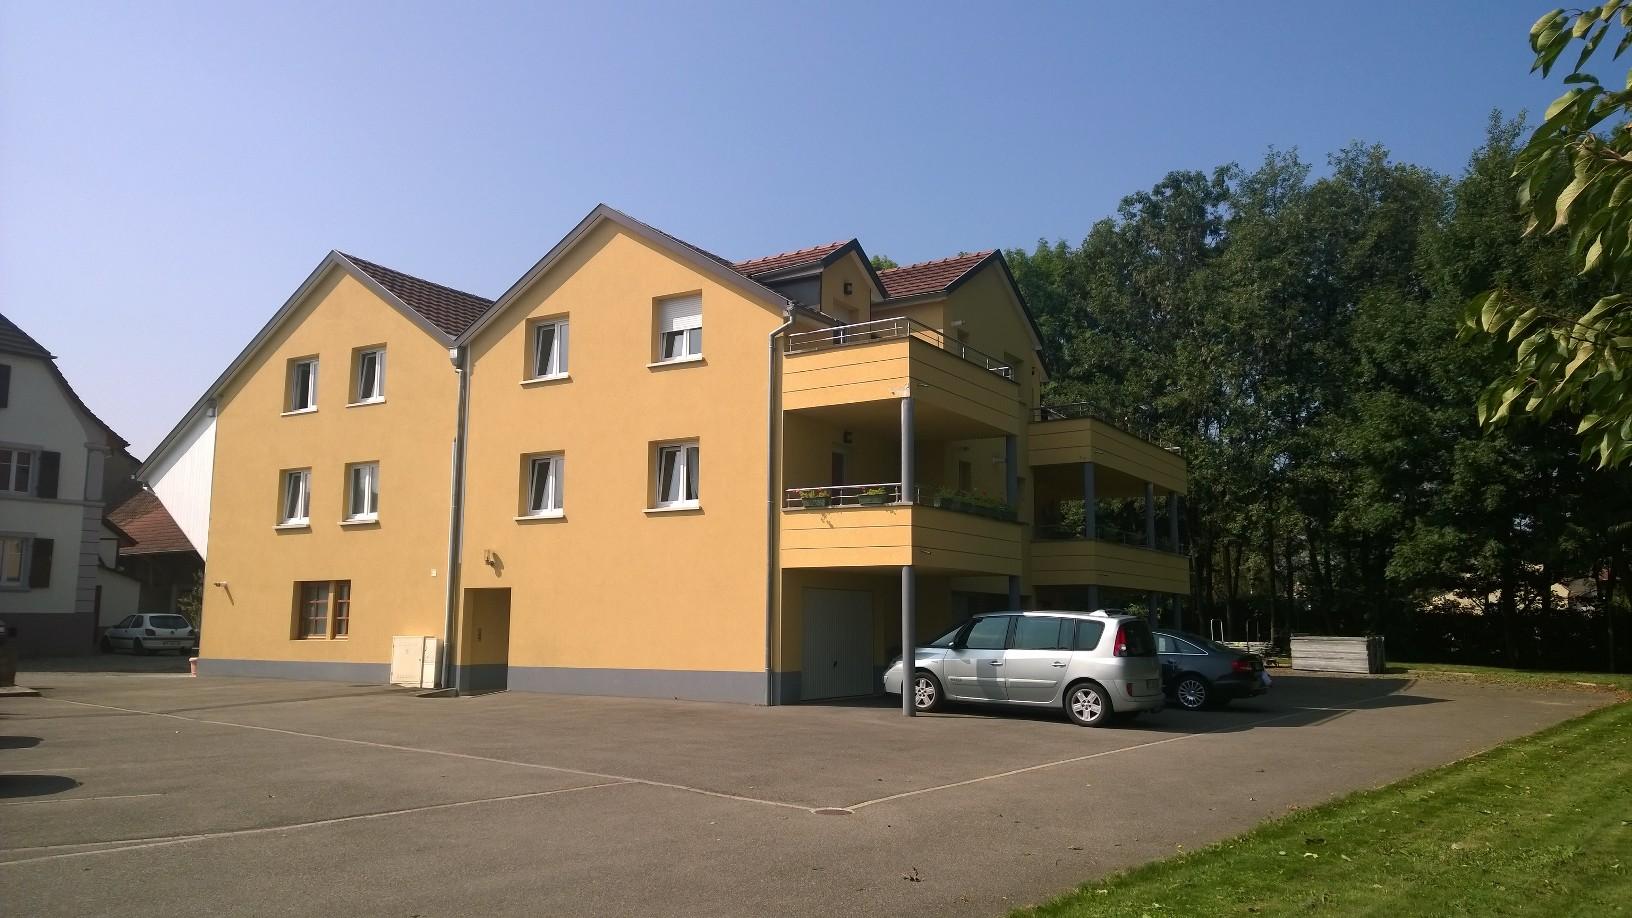 Travaux De Ma Onnerie R Novation Immobili Re Wittenheim